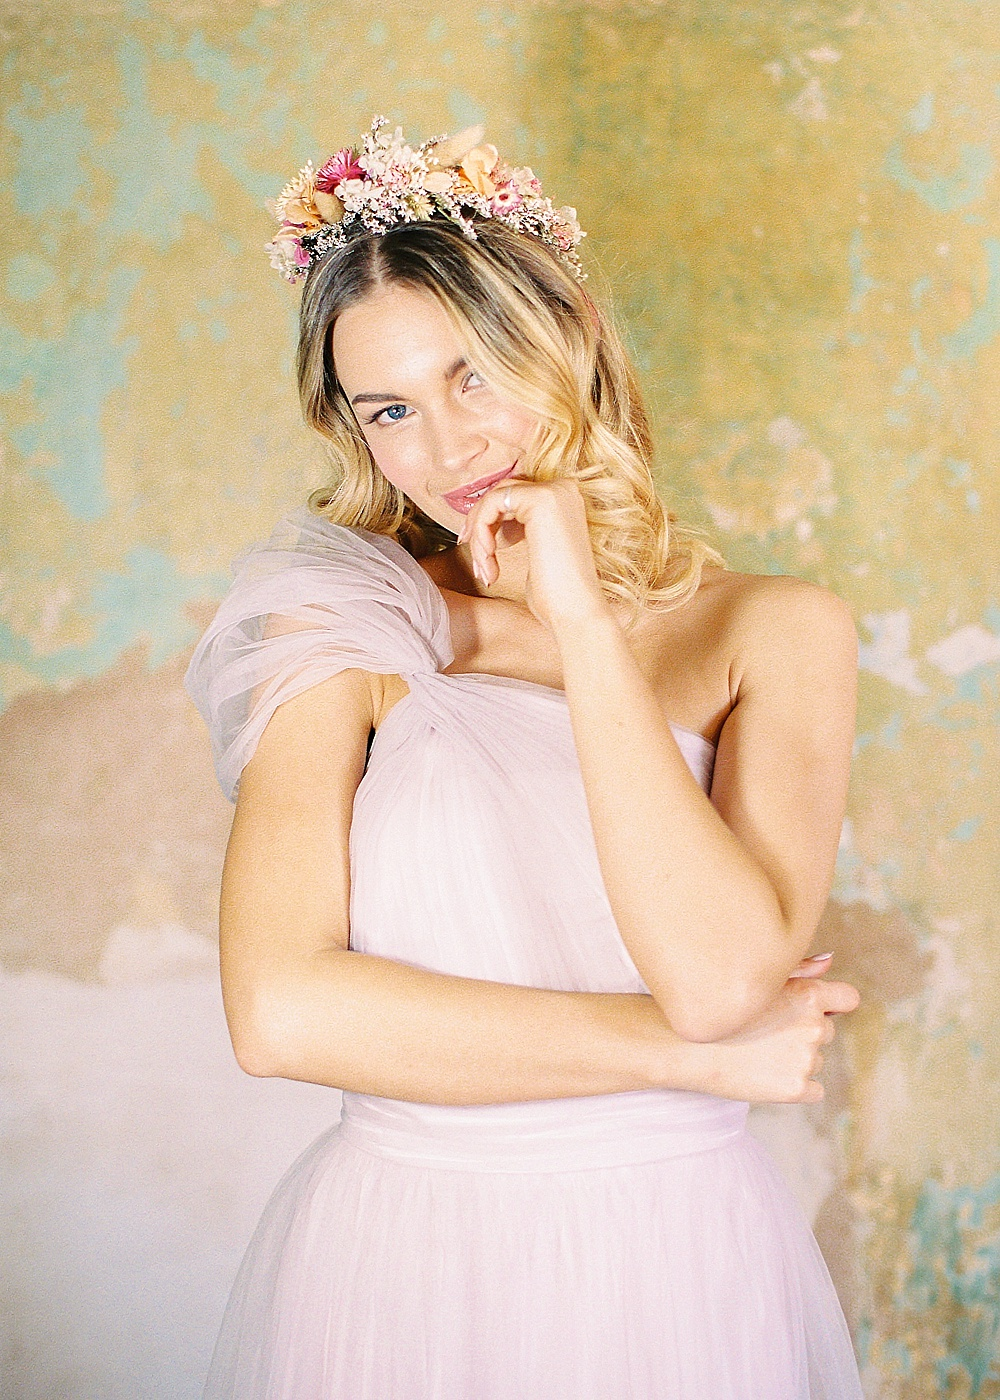 Atemberaubend Ethereal Bridesmaid Dresses Galerie - Brautkleider ...